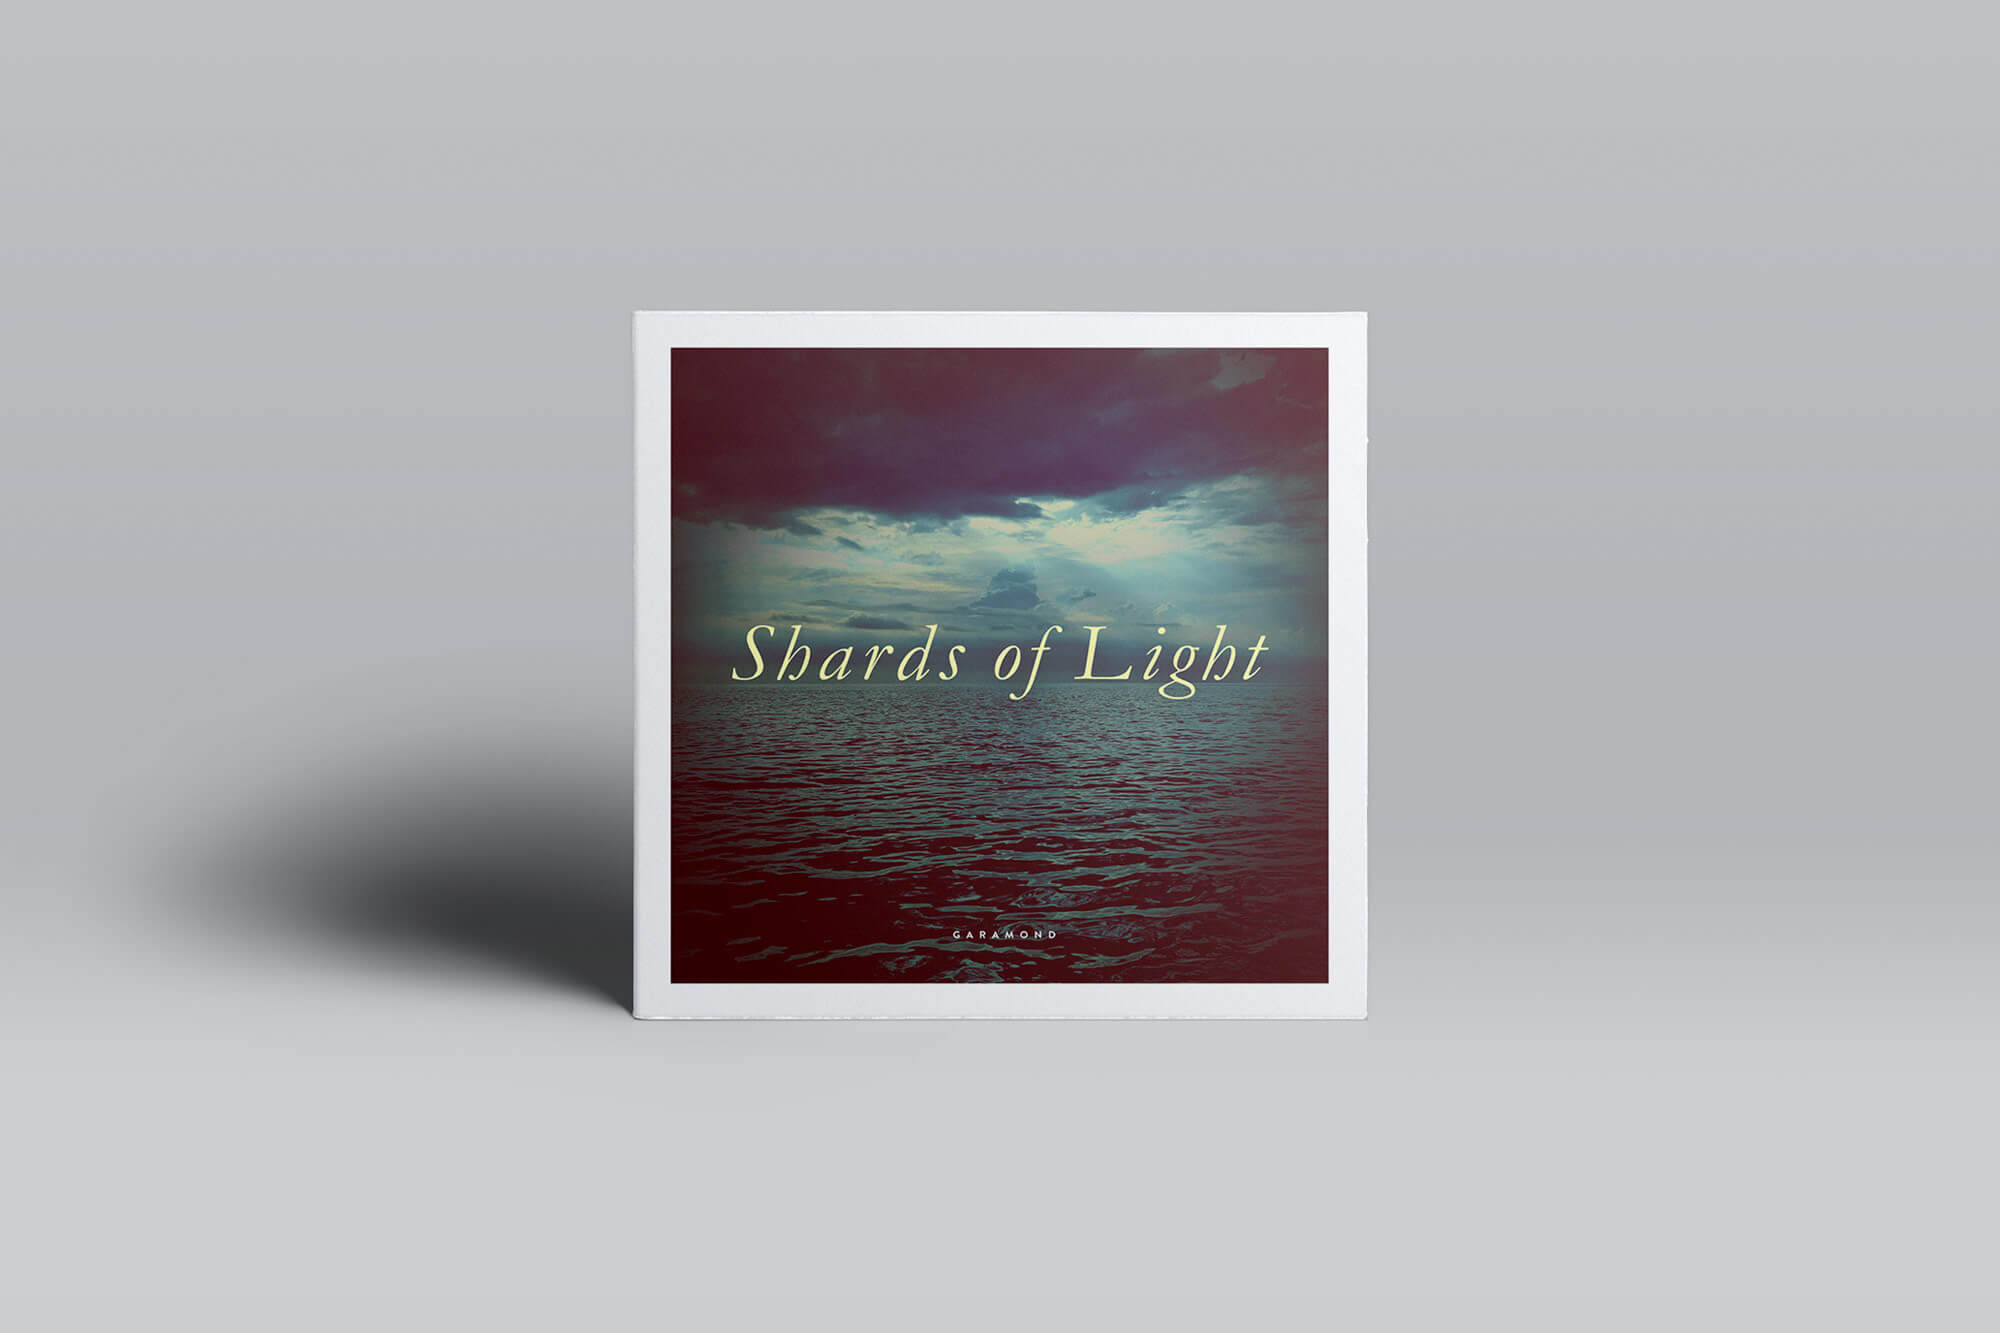 gareth-paul-jones-studio-design-garamond-music-shards-of-light-ep-cs-02